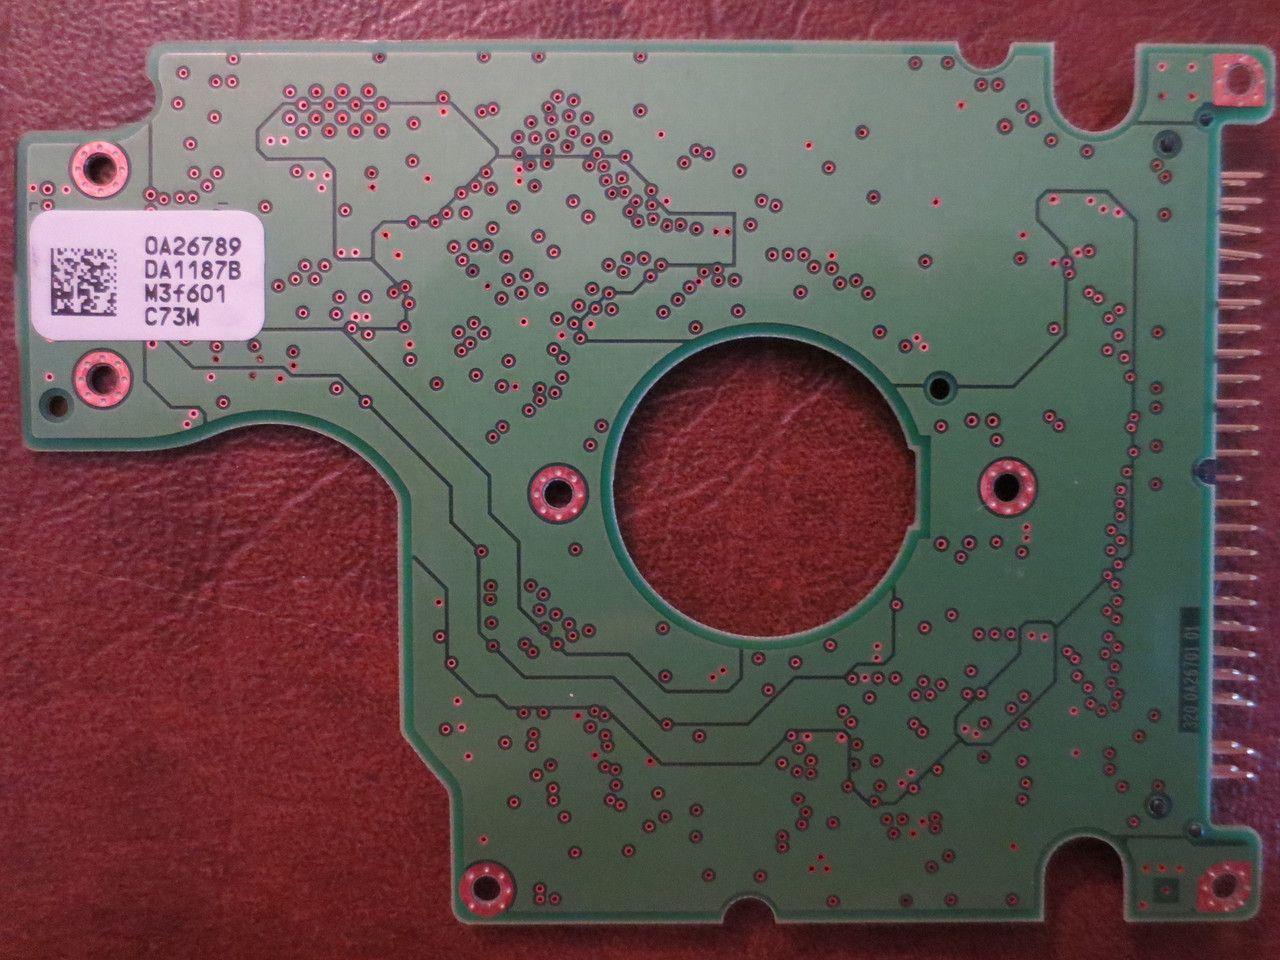 Hitachi Hts421260h9at00 Pn0a26306 Mlcda1303 0a26789 Da1187b 60gb Hard Drive Circuit Board For Data Recovery Ide Pcb Effective Electronics Datarecovery Harddriverepair Computerrepair